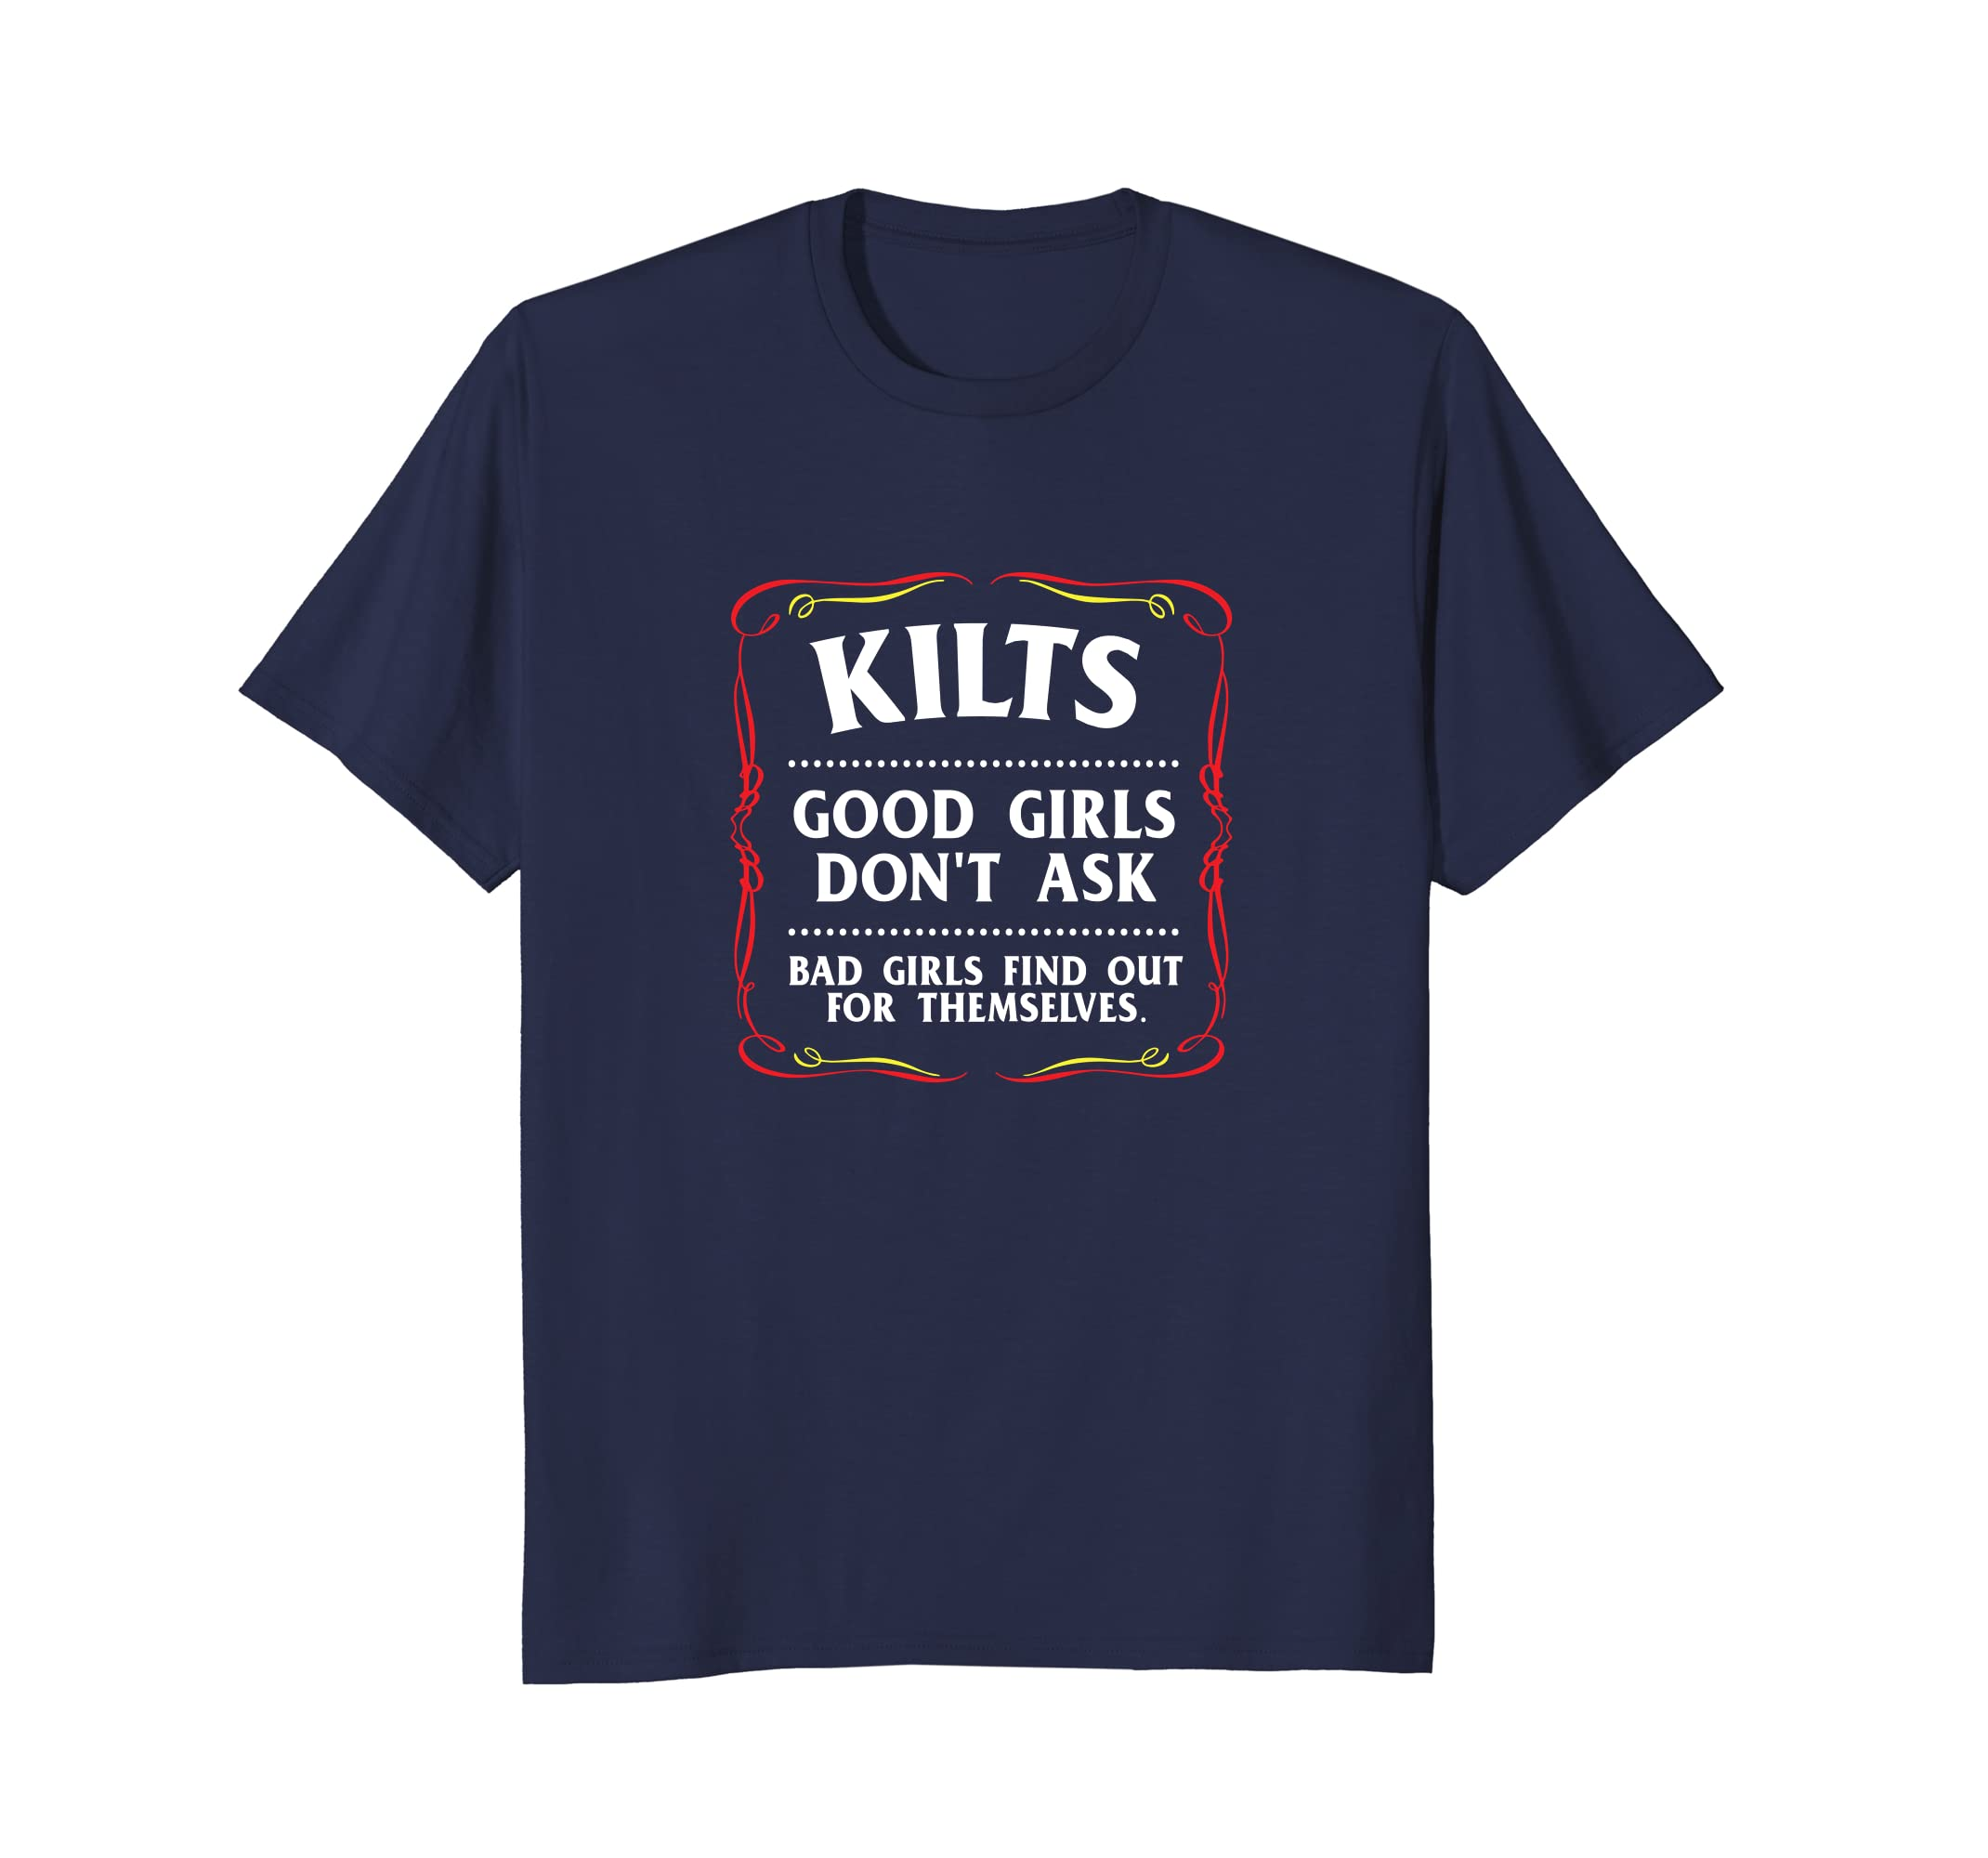 Kilts Good Girls Don't Ask T-shirt Funny Scottish Tee-mt